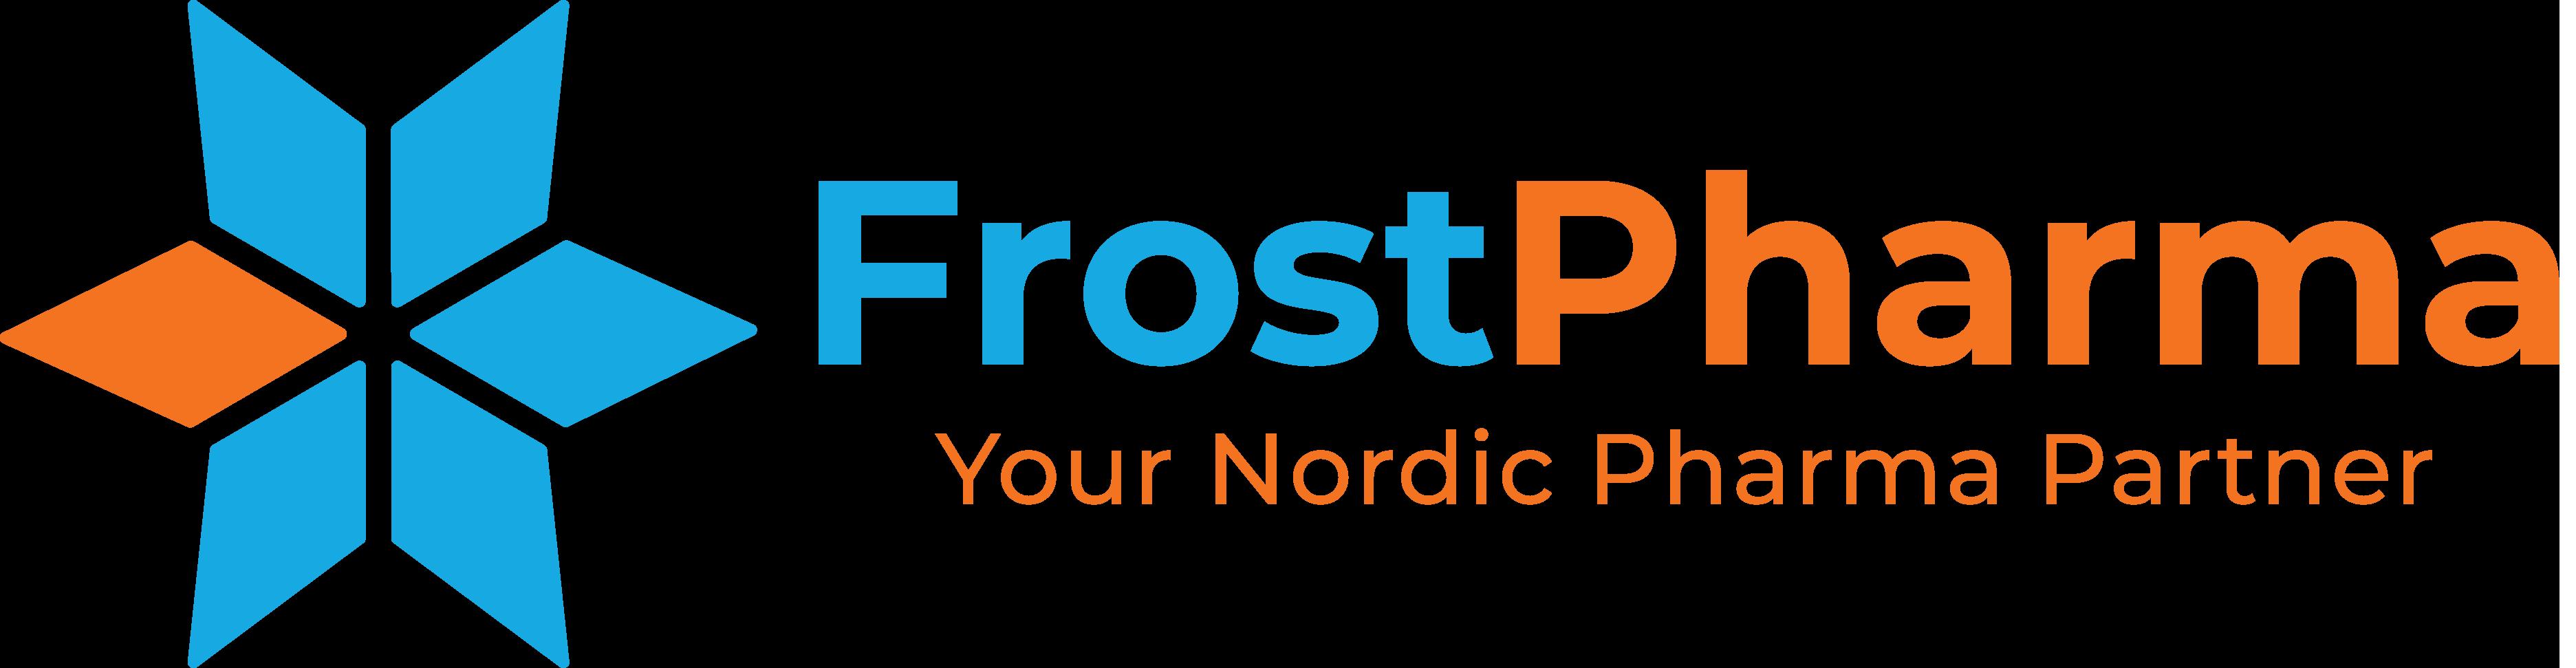 FrostPharma komplett logotyp